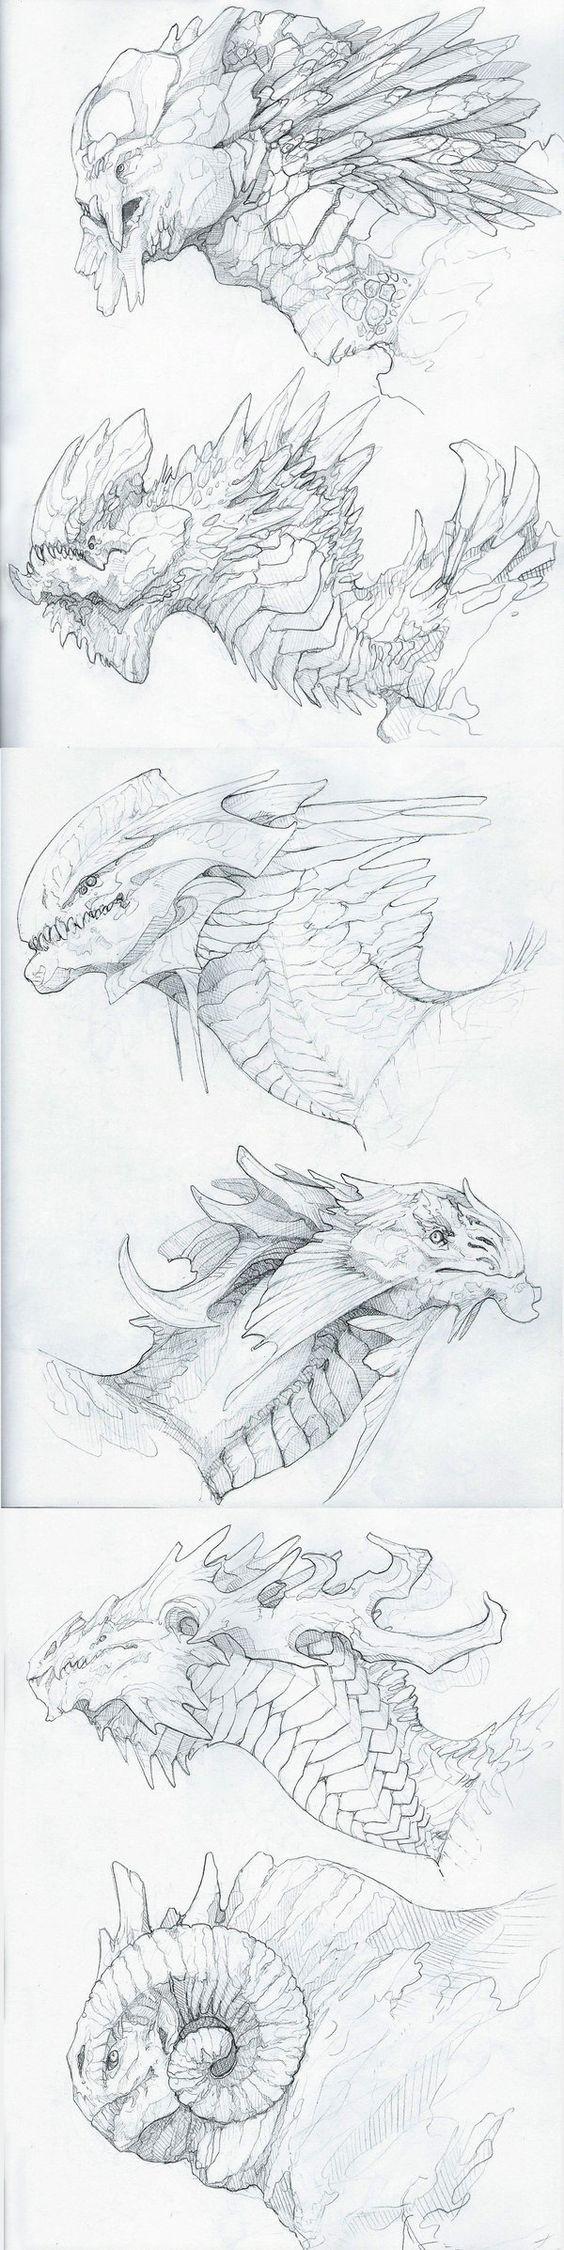 Dragon heads for Jesse! by OddOsprey.deviantart.com on @DeviantArt    ★ || CHARACTER DESIGN REFERENCES™ (https://www.facebook.com/CharacterDesignReferences & https://www.pinterest.com/characterdesigh) • Love Character Design? Join the #CDChallenge (link→ https://www.facebook.com/groups/CharacterDesignChallenge) Promote your art in a community of over 50.000 artists! || ★